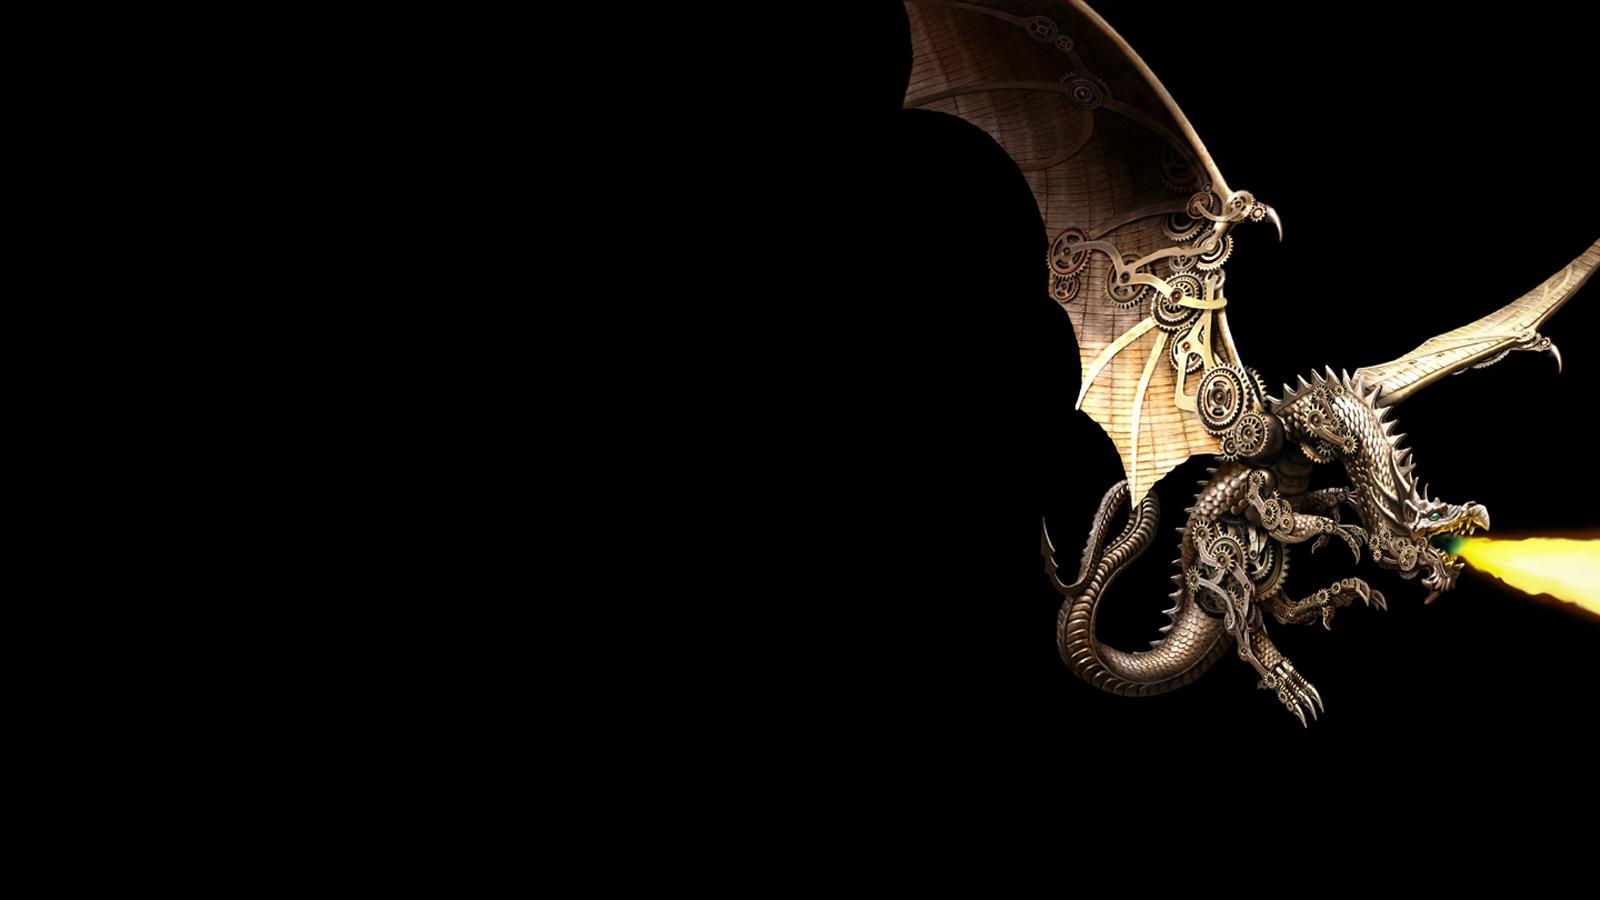 Dragon Black Gears Steampunk Machine mechanical wallpaper background 1600x900